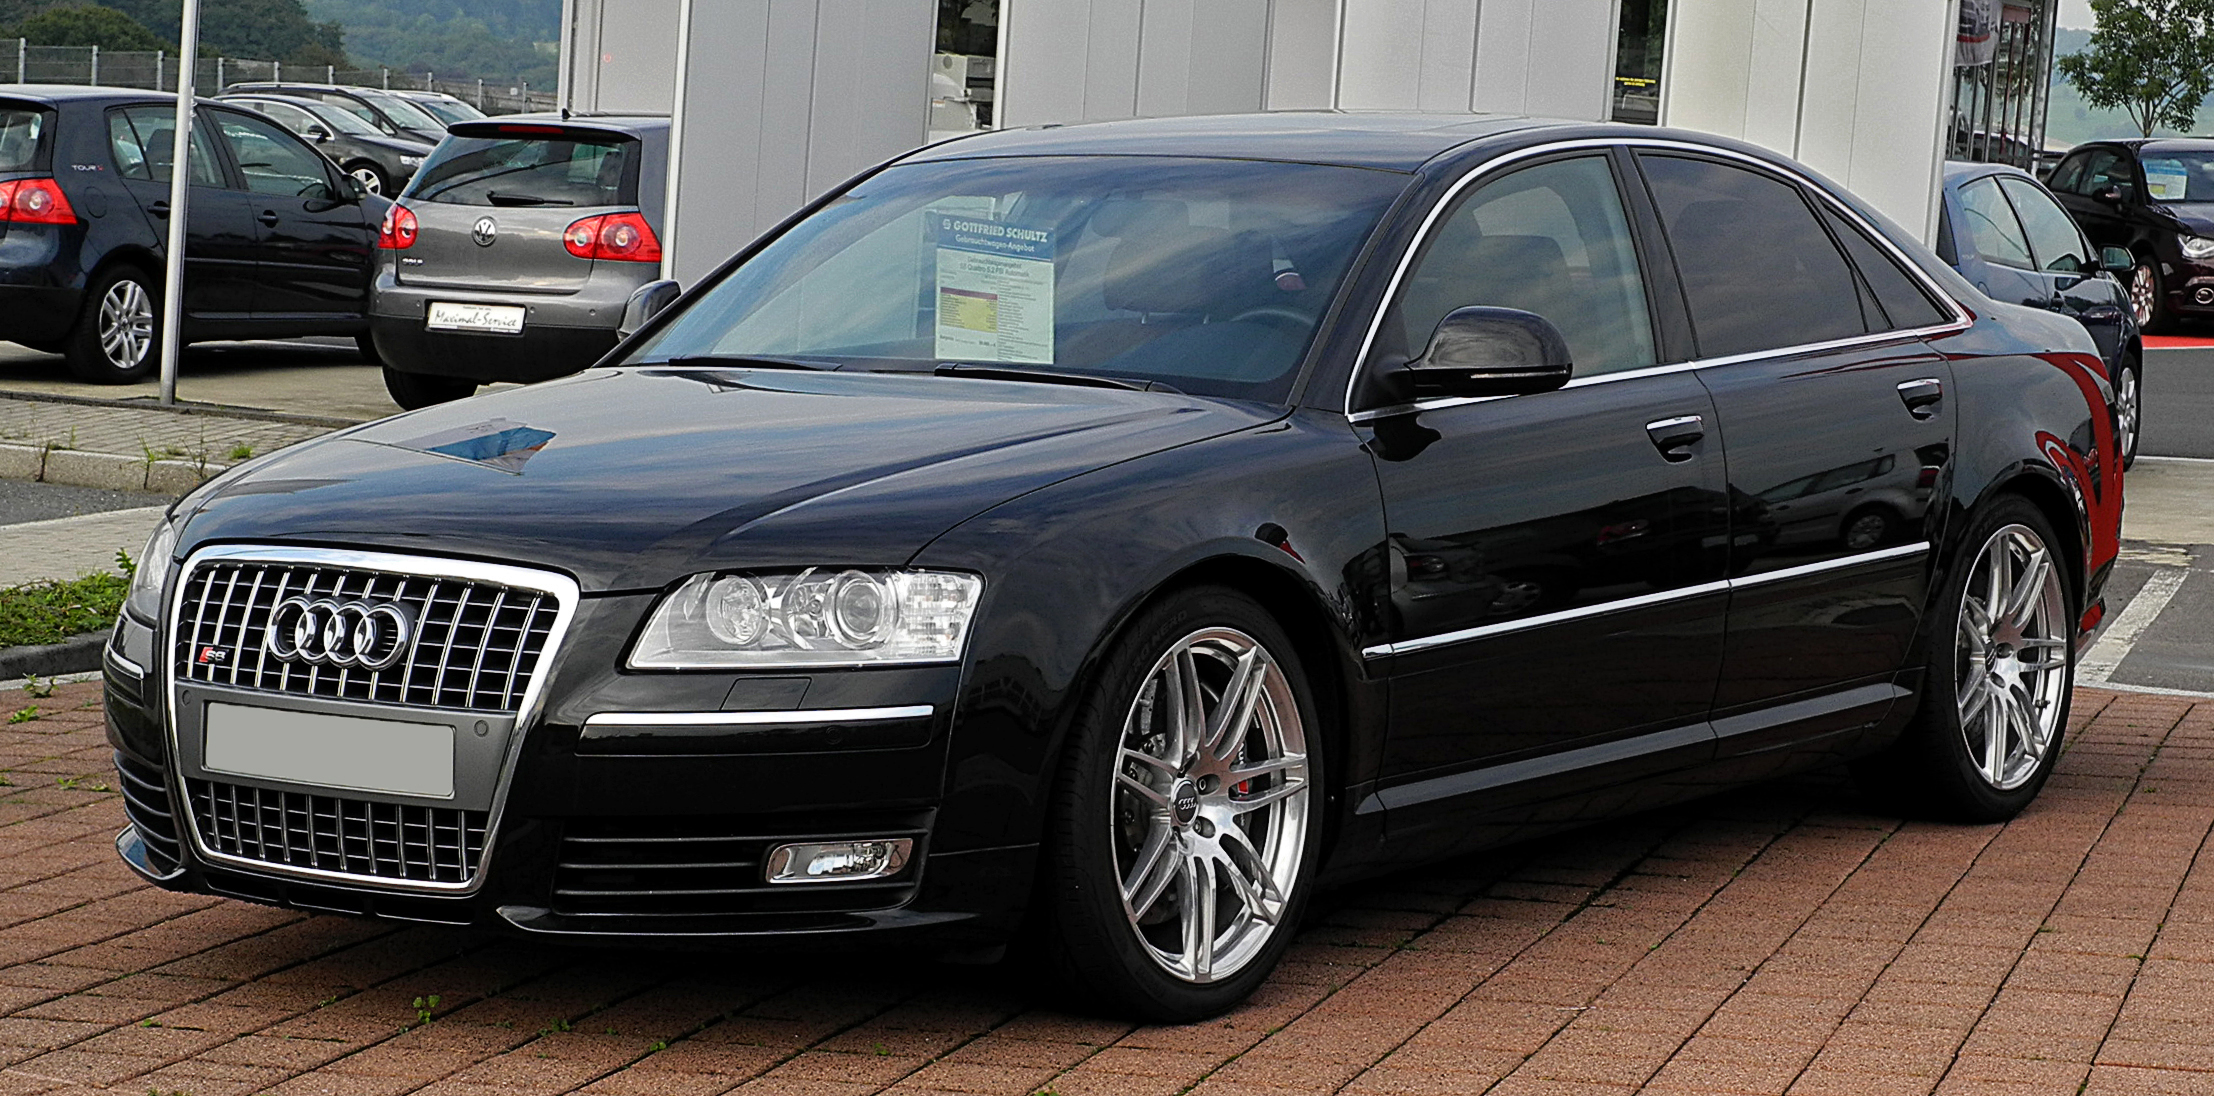 File:Audi S8 (D3, 2. Facelift) – Frontansicht, 21. Juli 2011 ...